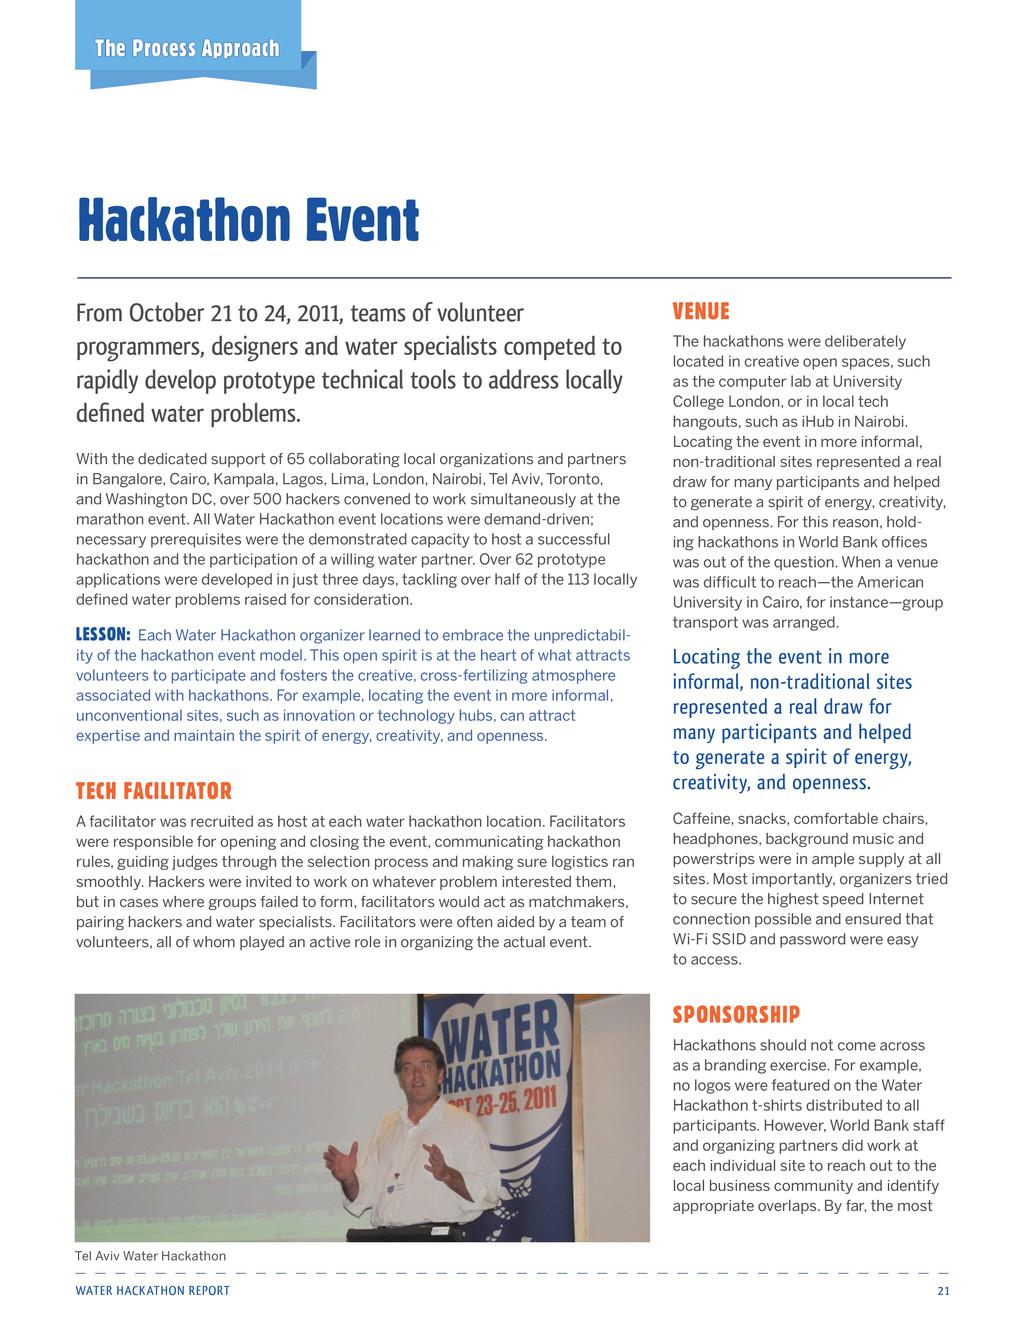 Water Hackathon Report 21 Hackathon Event The P...